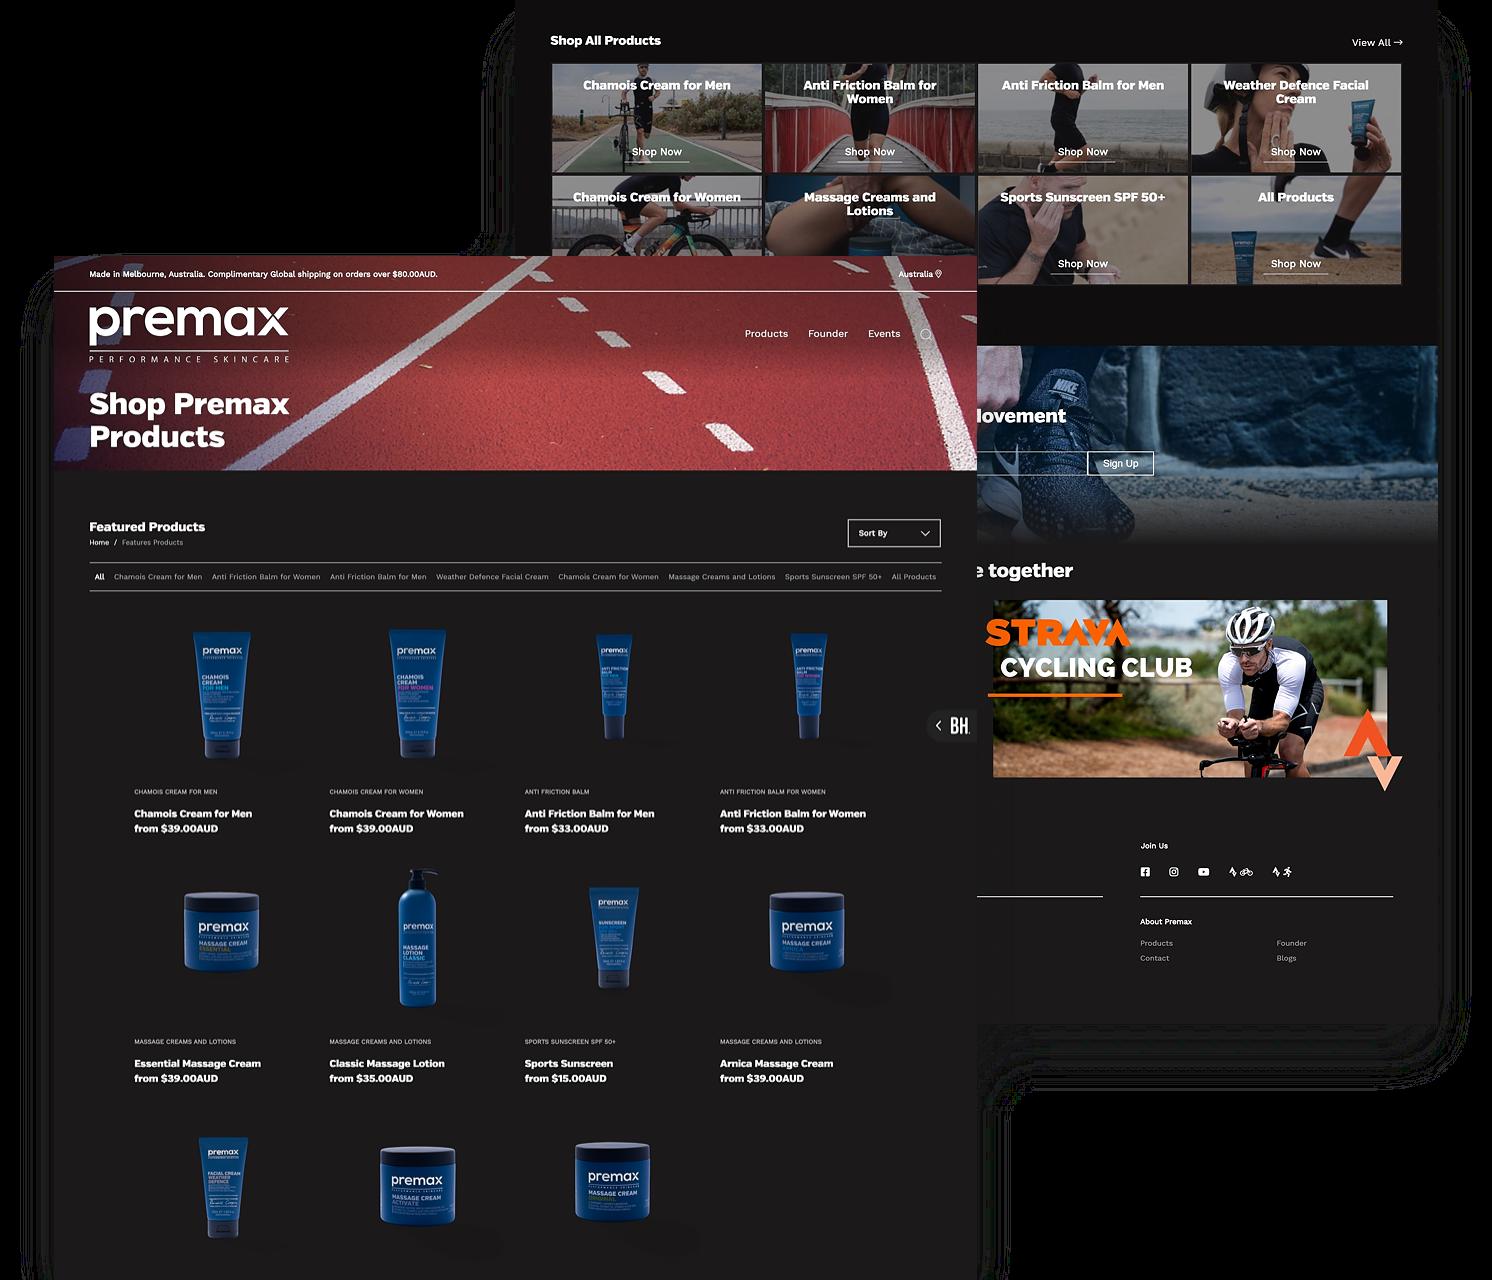 Premax demo product image.